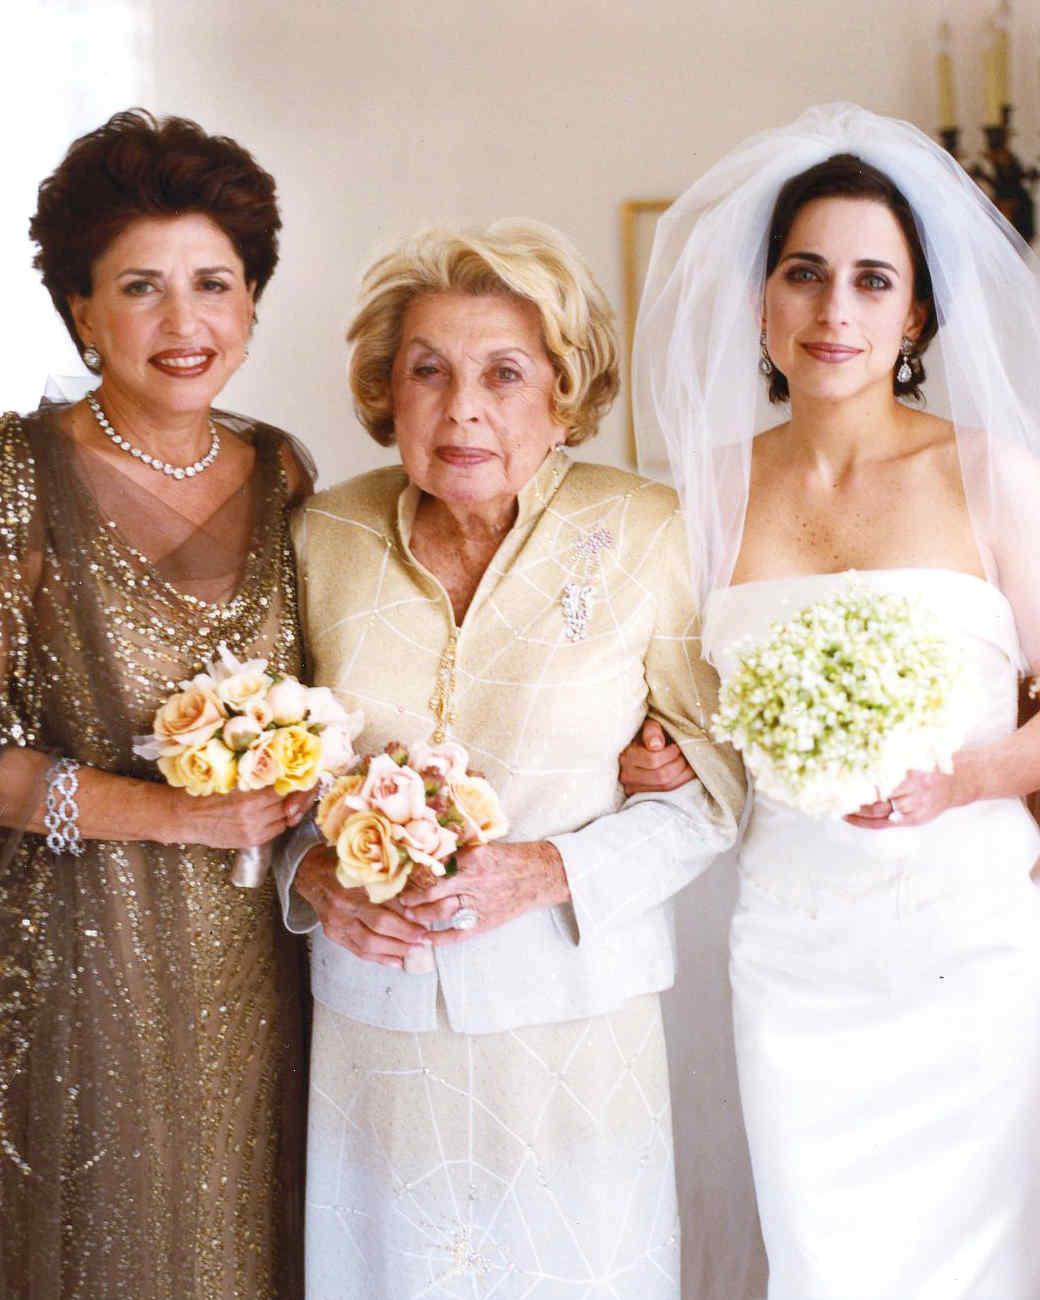 Celebrating Mom: Lessons on Living the Family Way | Martha Stewart